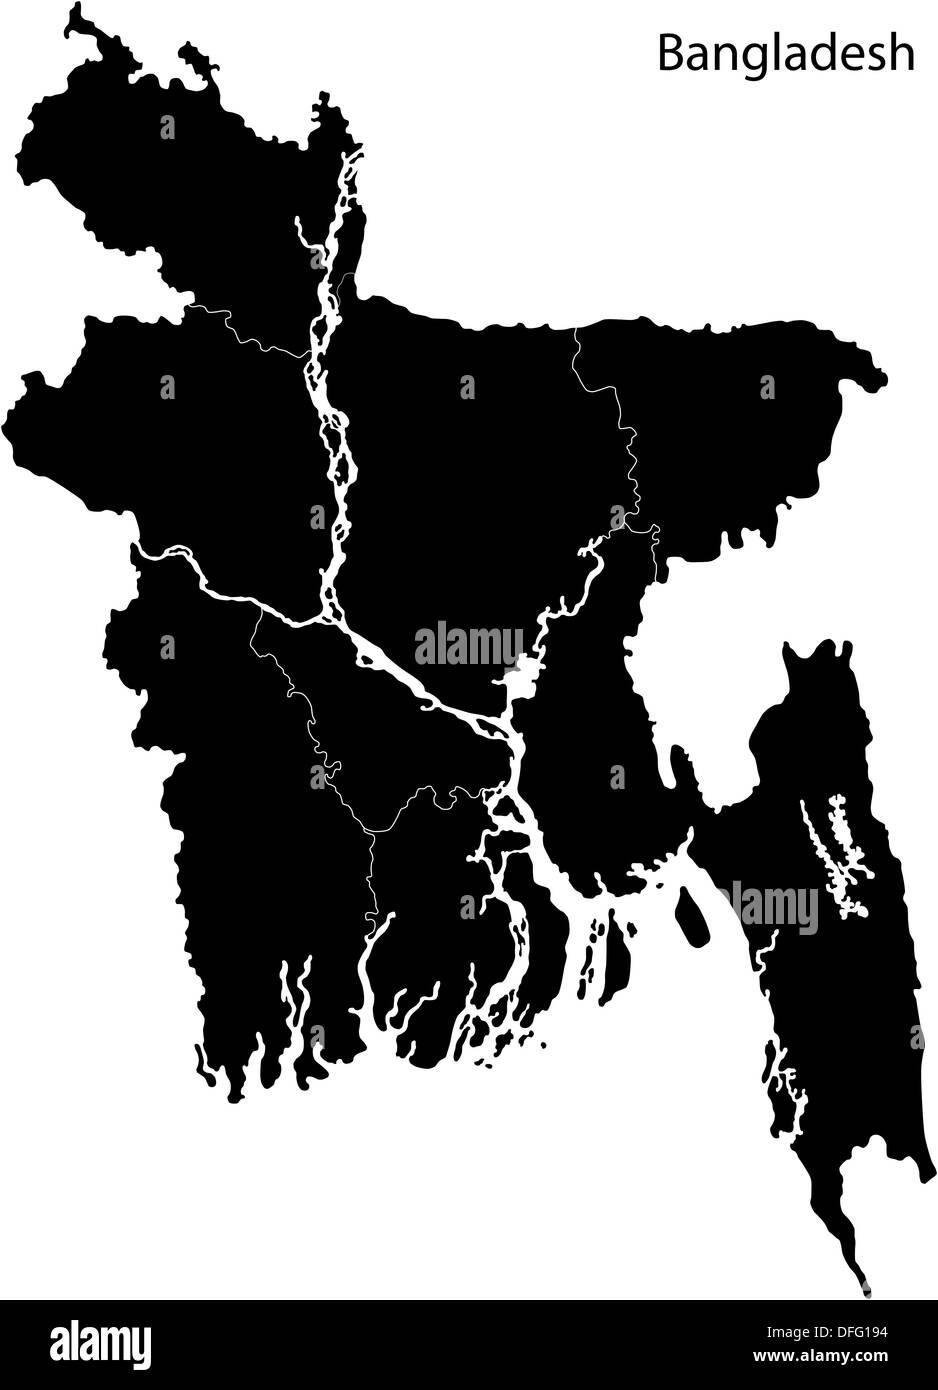 Black Bangladesh Map Stock Photo Royalty Free Image Alamy - Bangladesh map